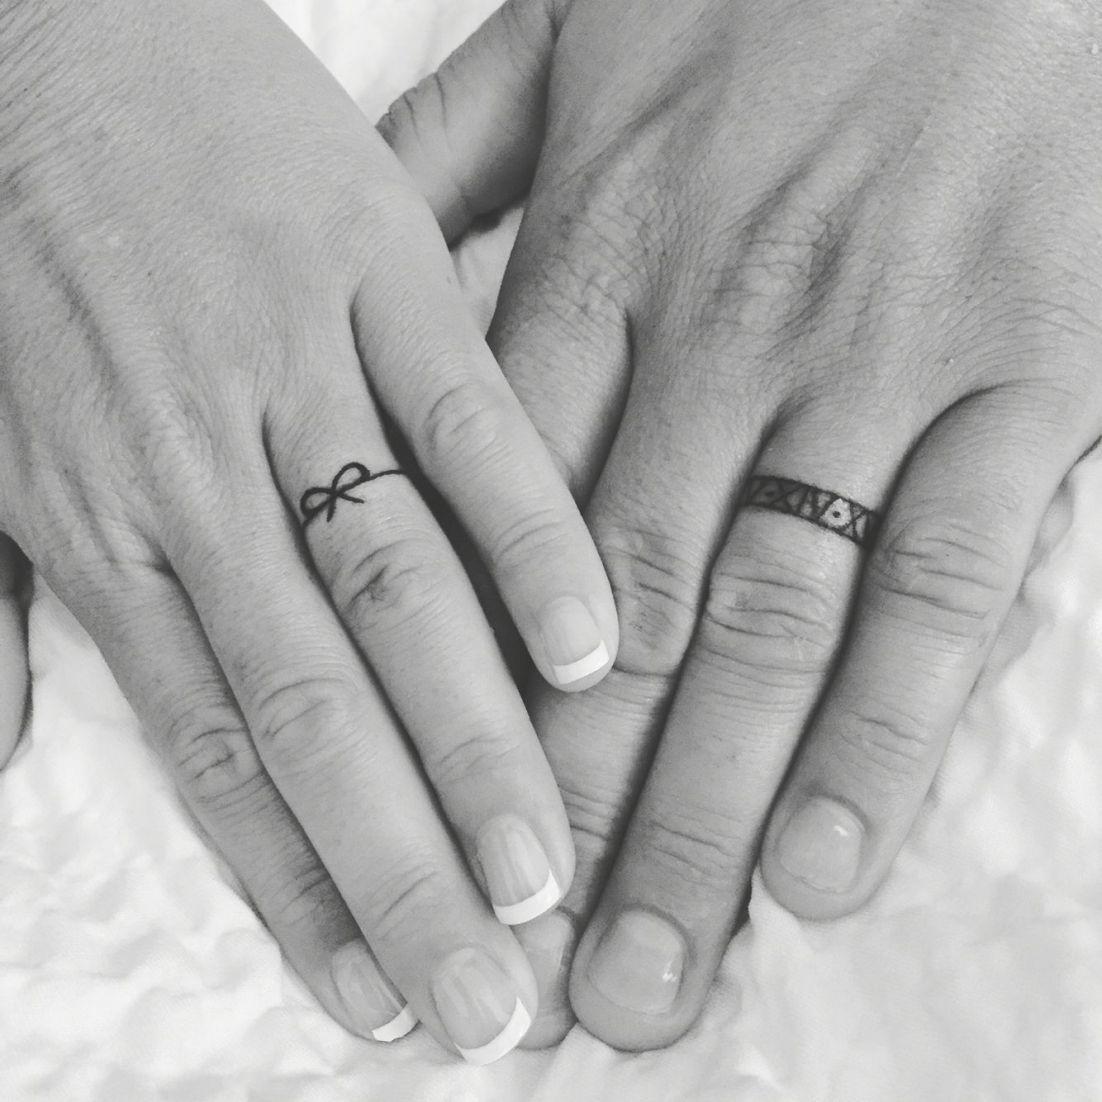 Husband And Wife Wedding Band Tattoos Ring Finger Tattoos Intended For Wedding B Hu Tatuaje De Anillo De Boda Tatuajes De Matrimonio Tatuaje De Una Banda